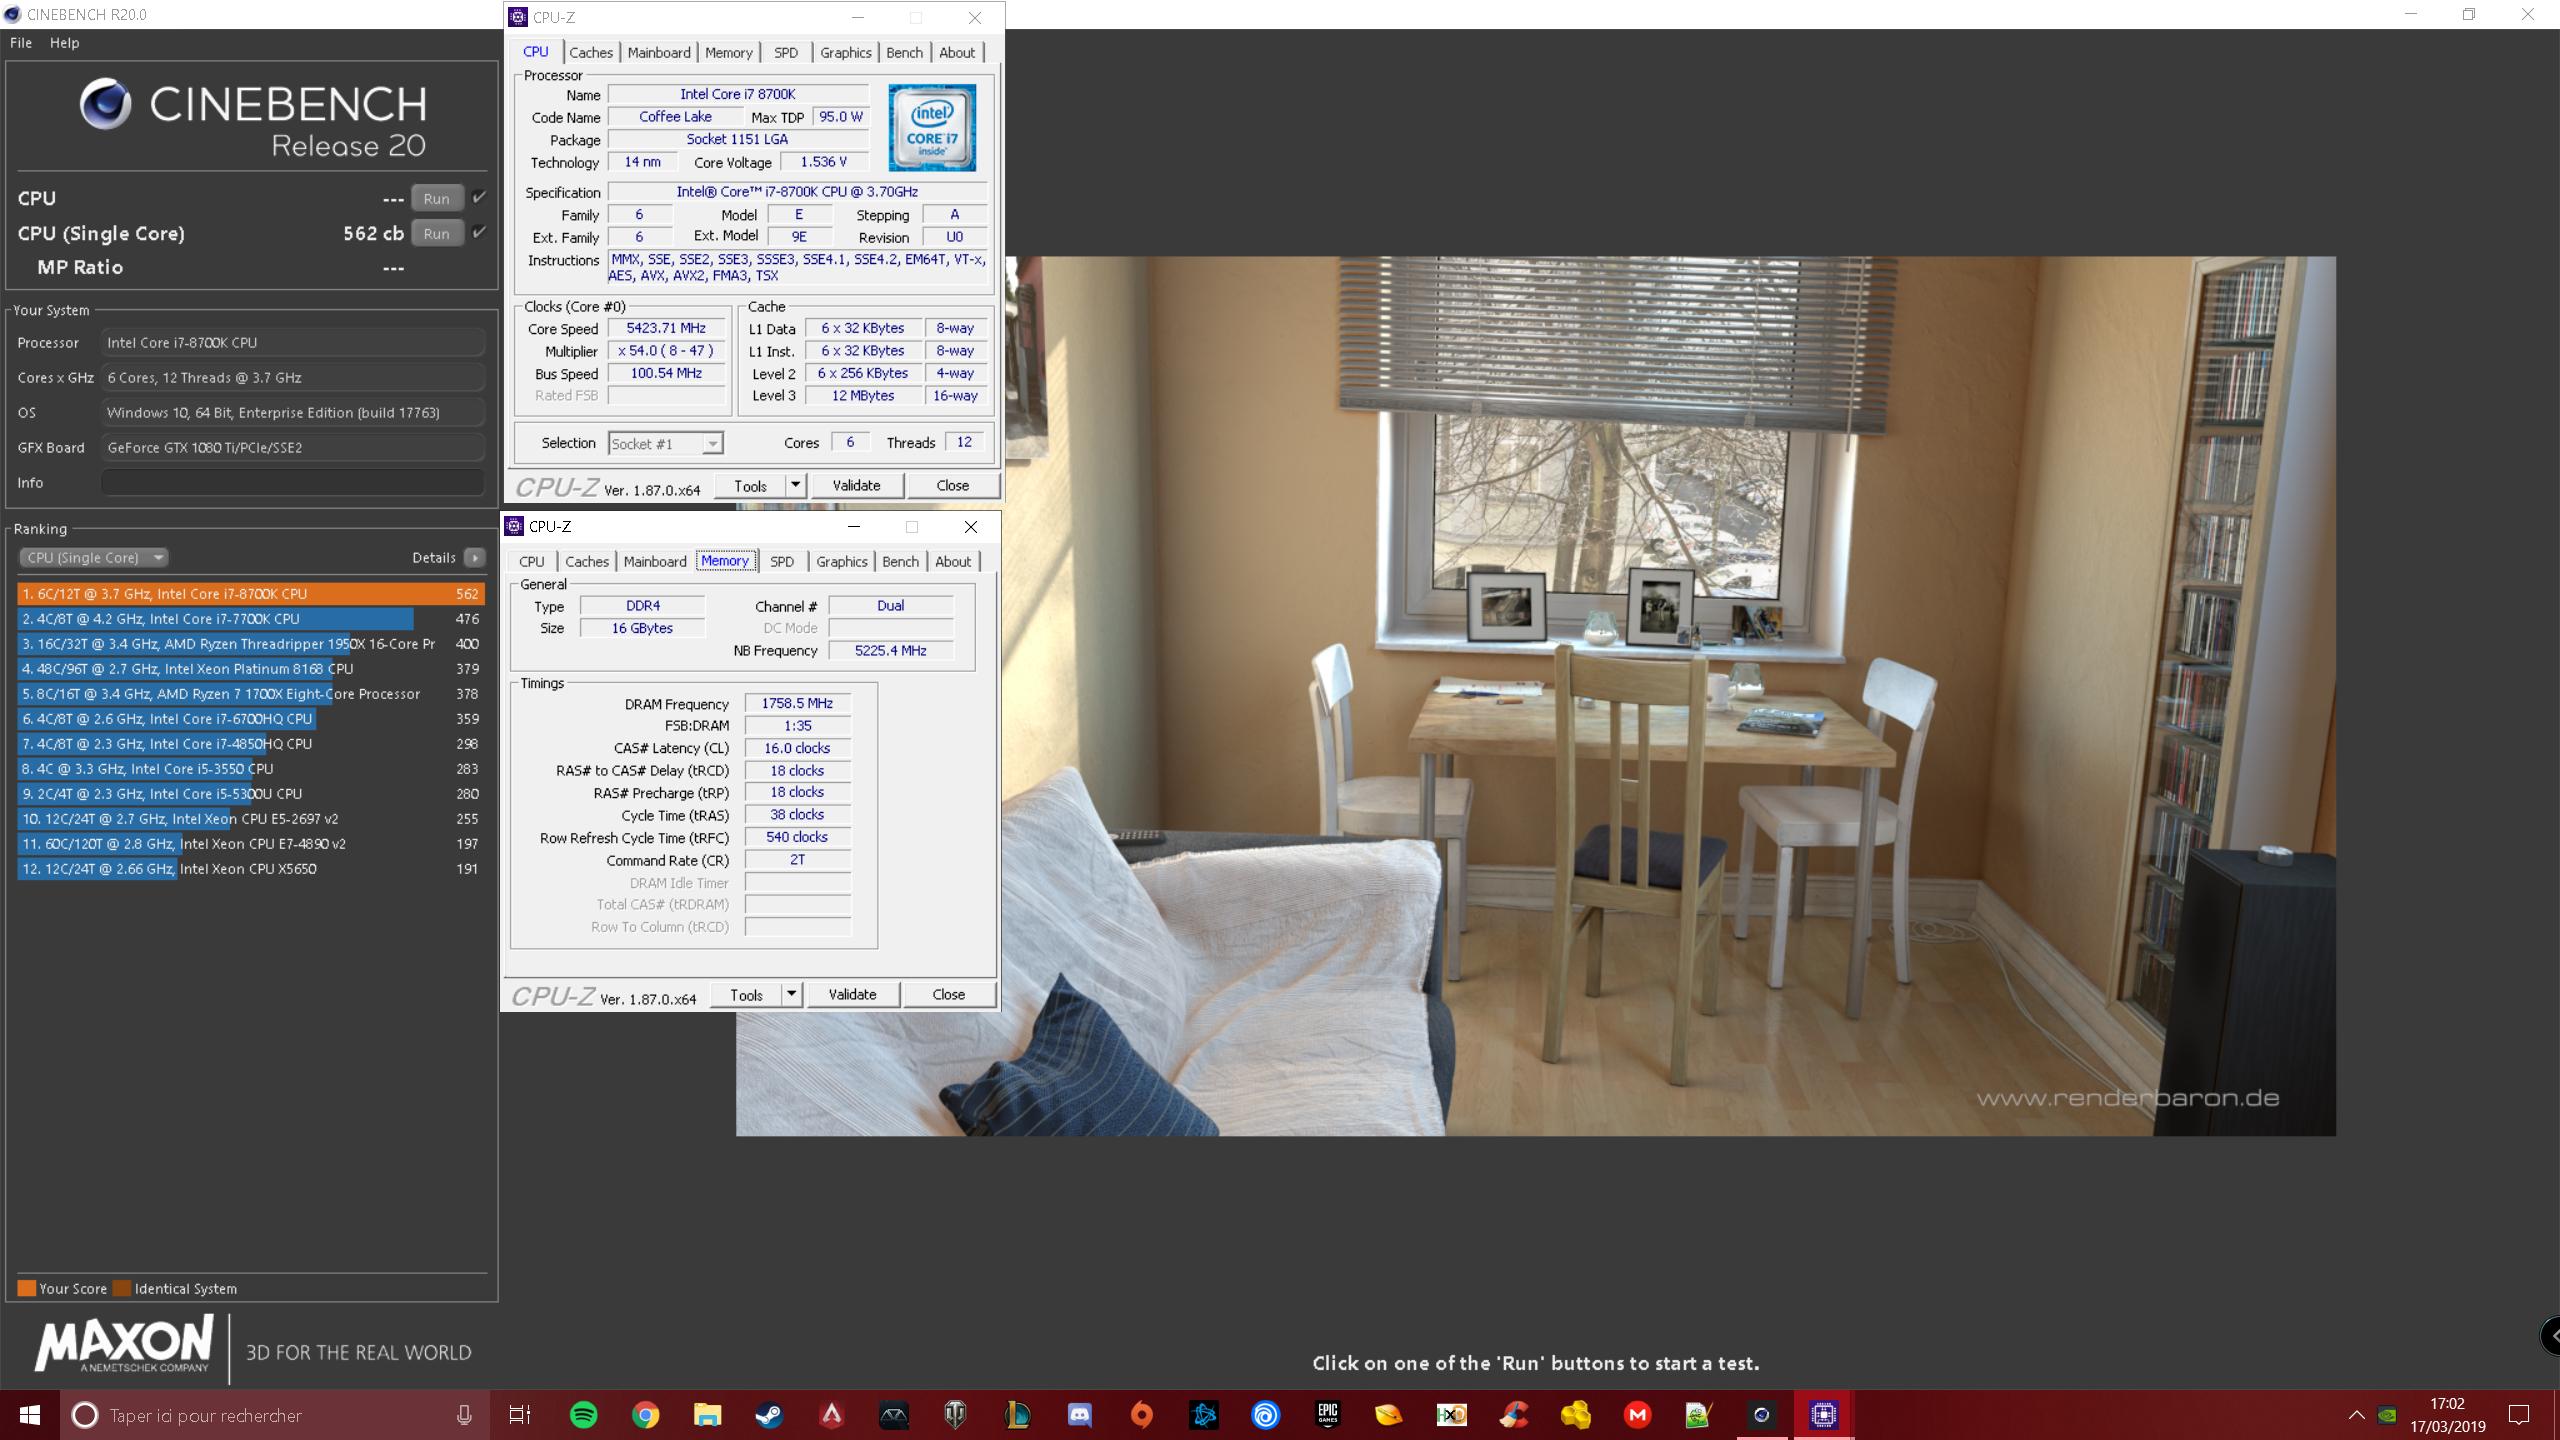 Desktop-Screenshot-2019-03-17-17-02-52-06.png